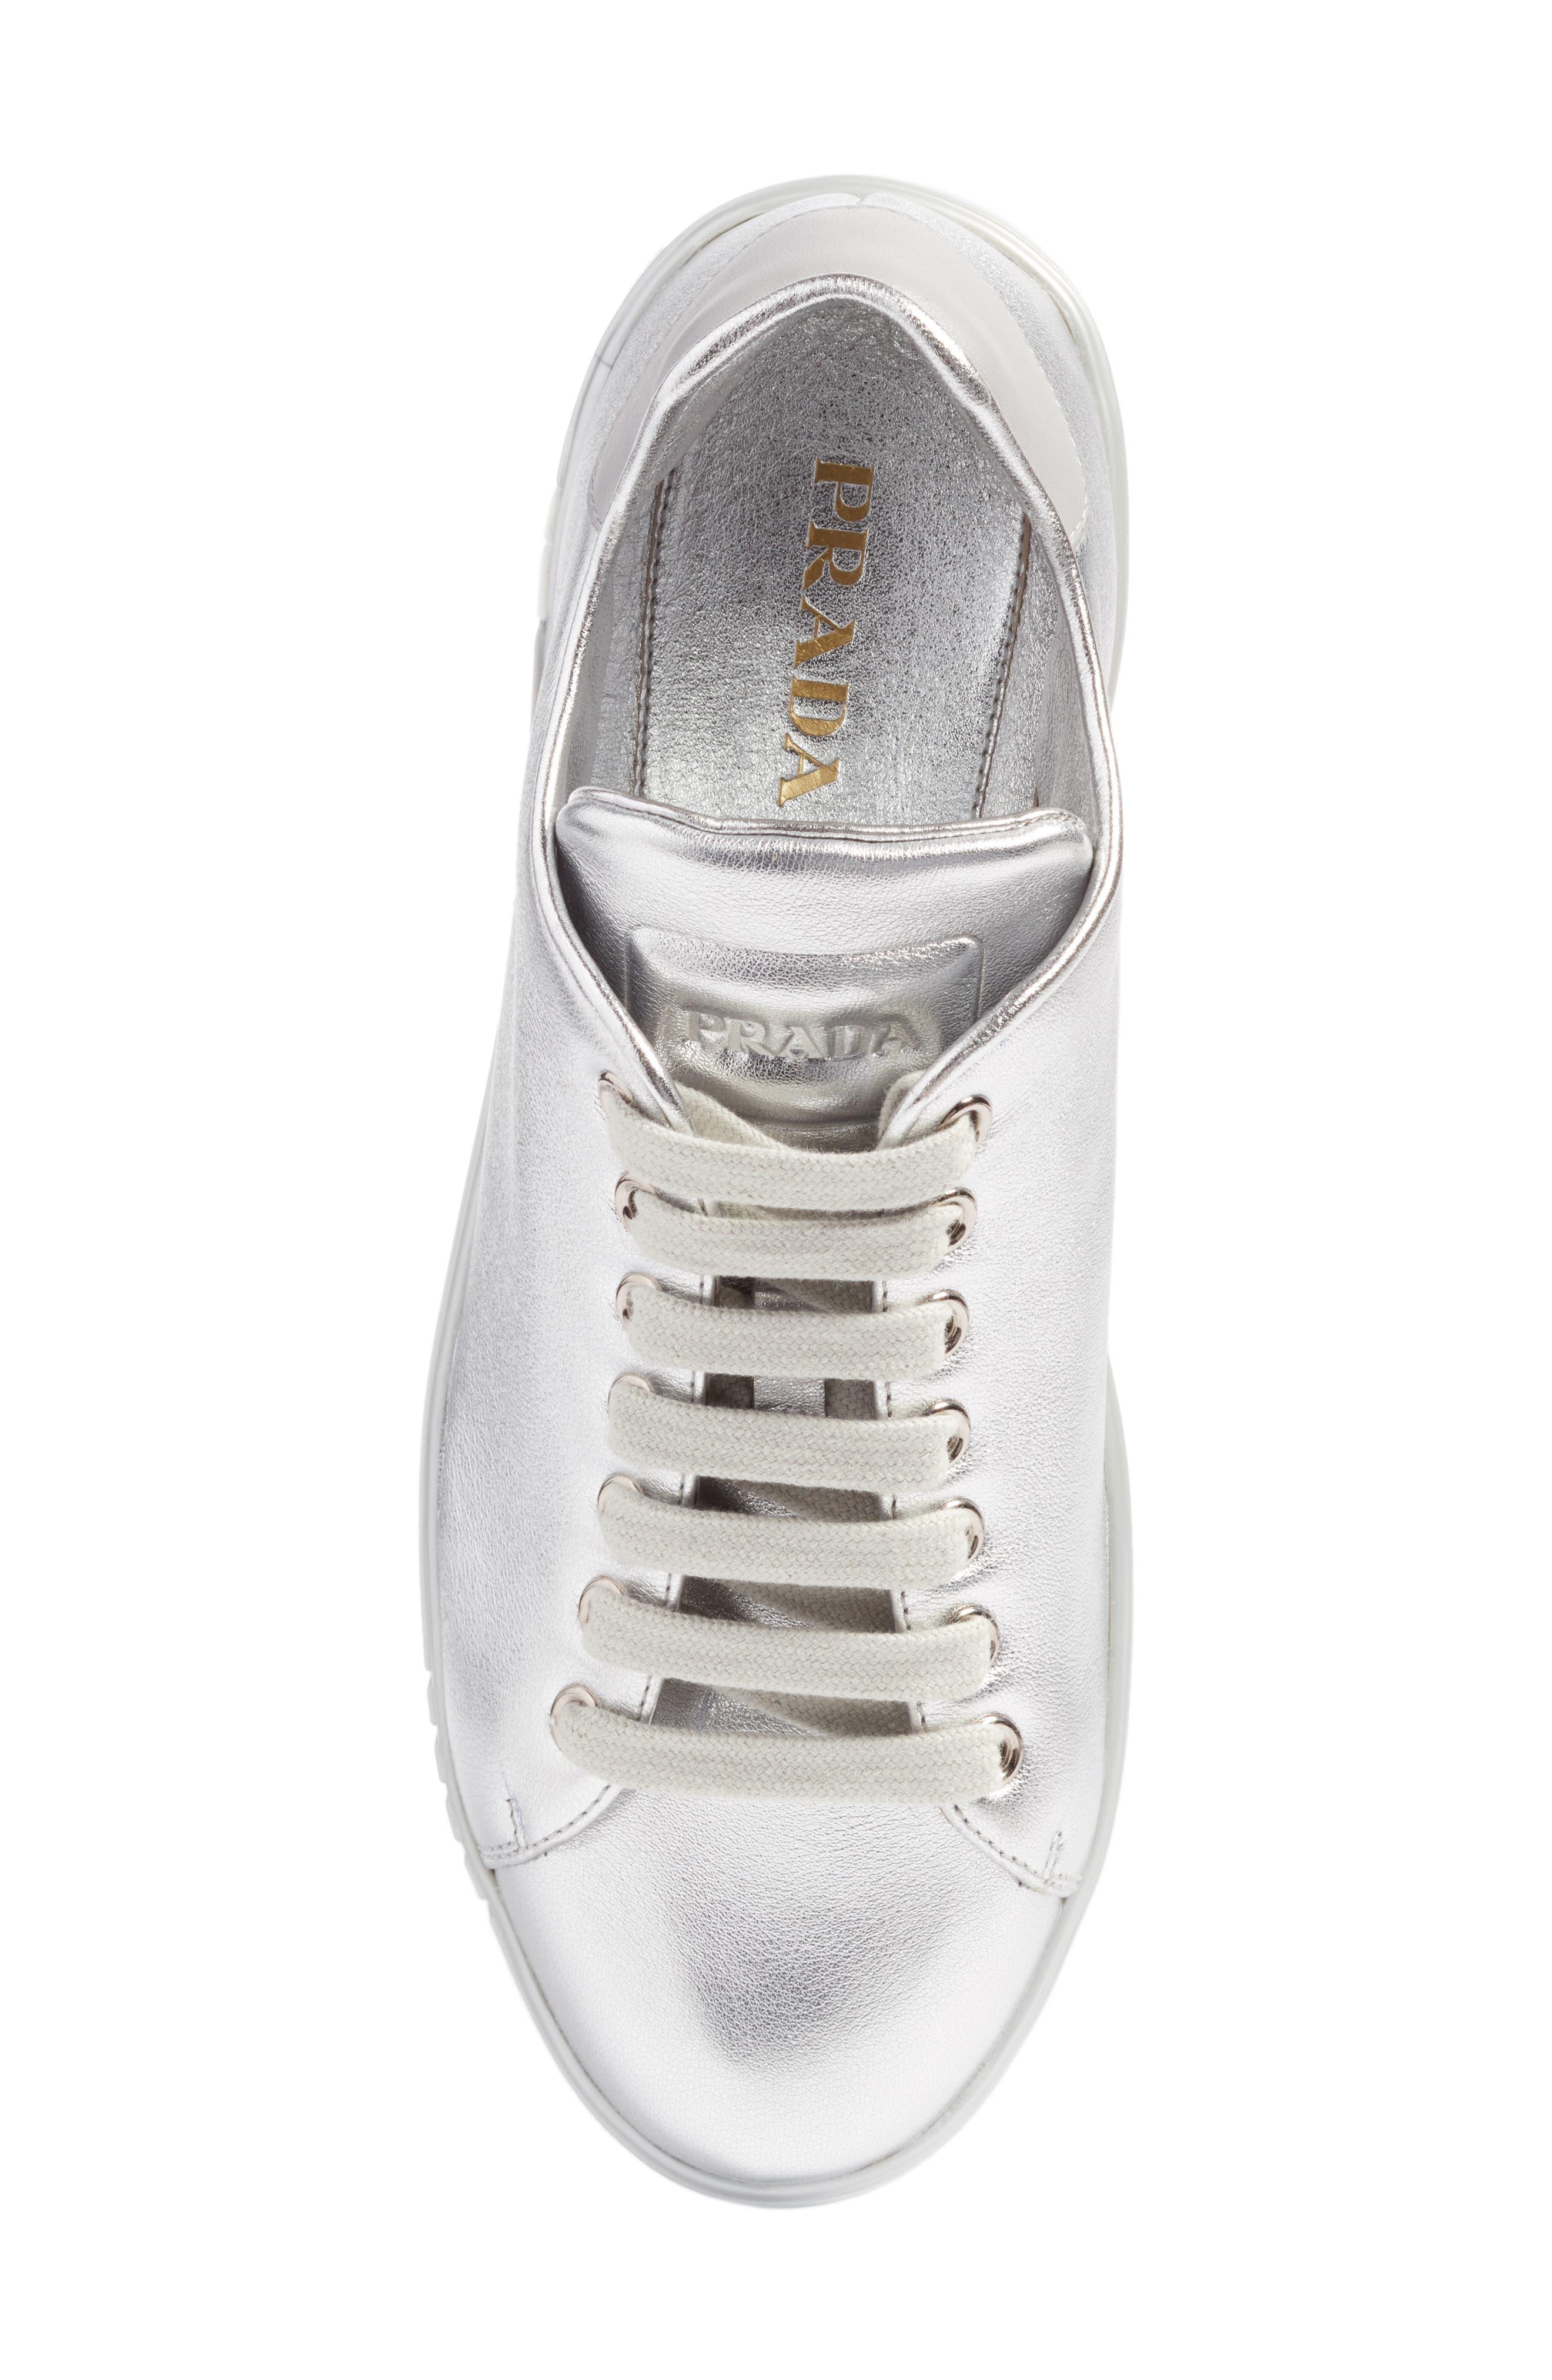 Low Top Sneaker,                             Alternate thumbnail 5, color,                             Metallic Silver